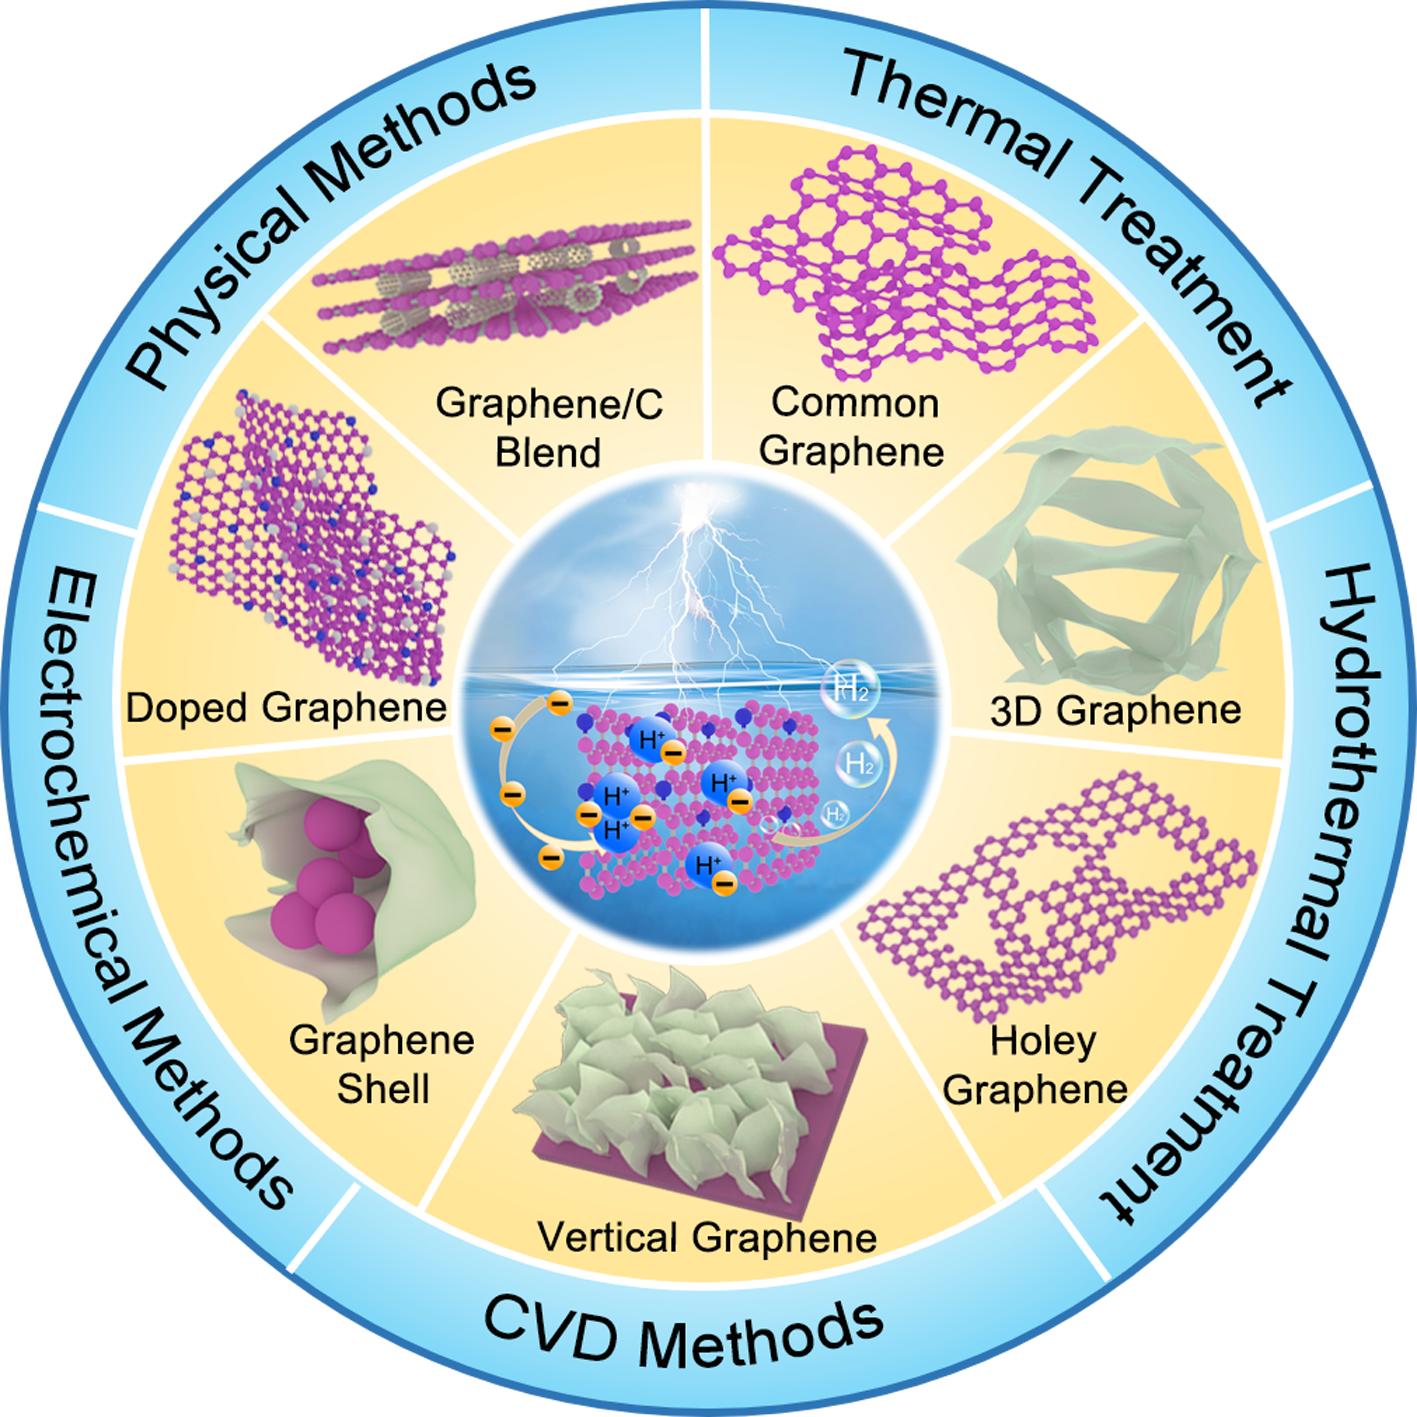 Advanced Materials:石墨烯基催化剂在电解水析氢反应中的研究进展